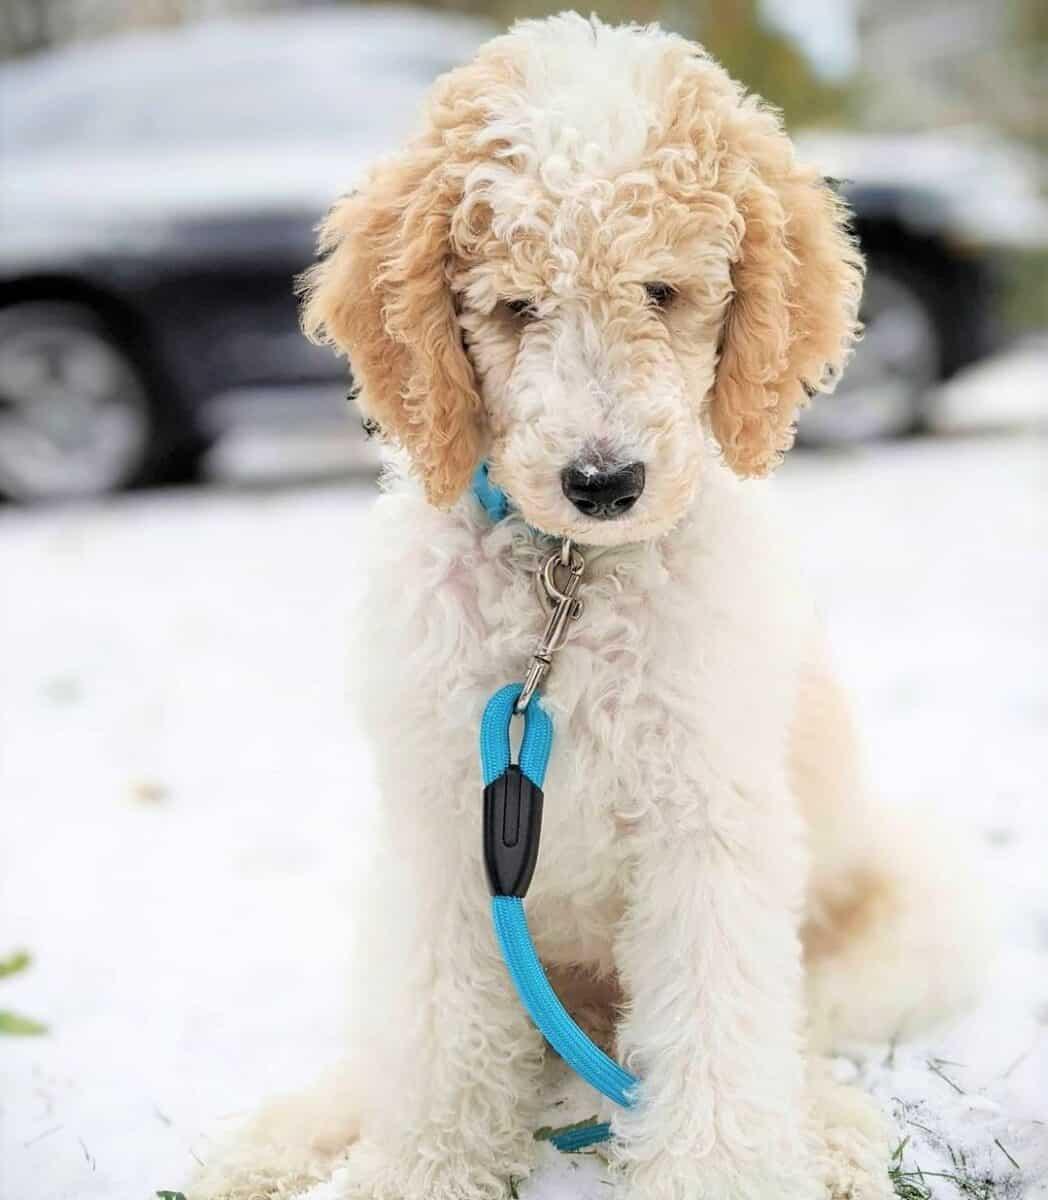 White and Cream Parti Poodle in winter